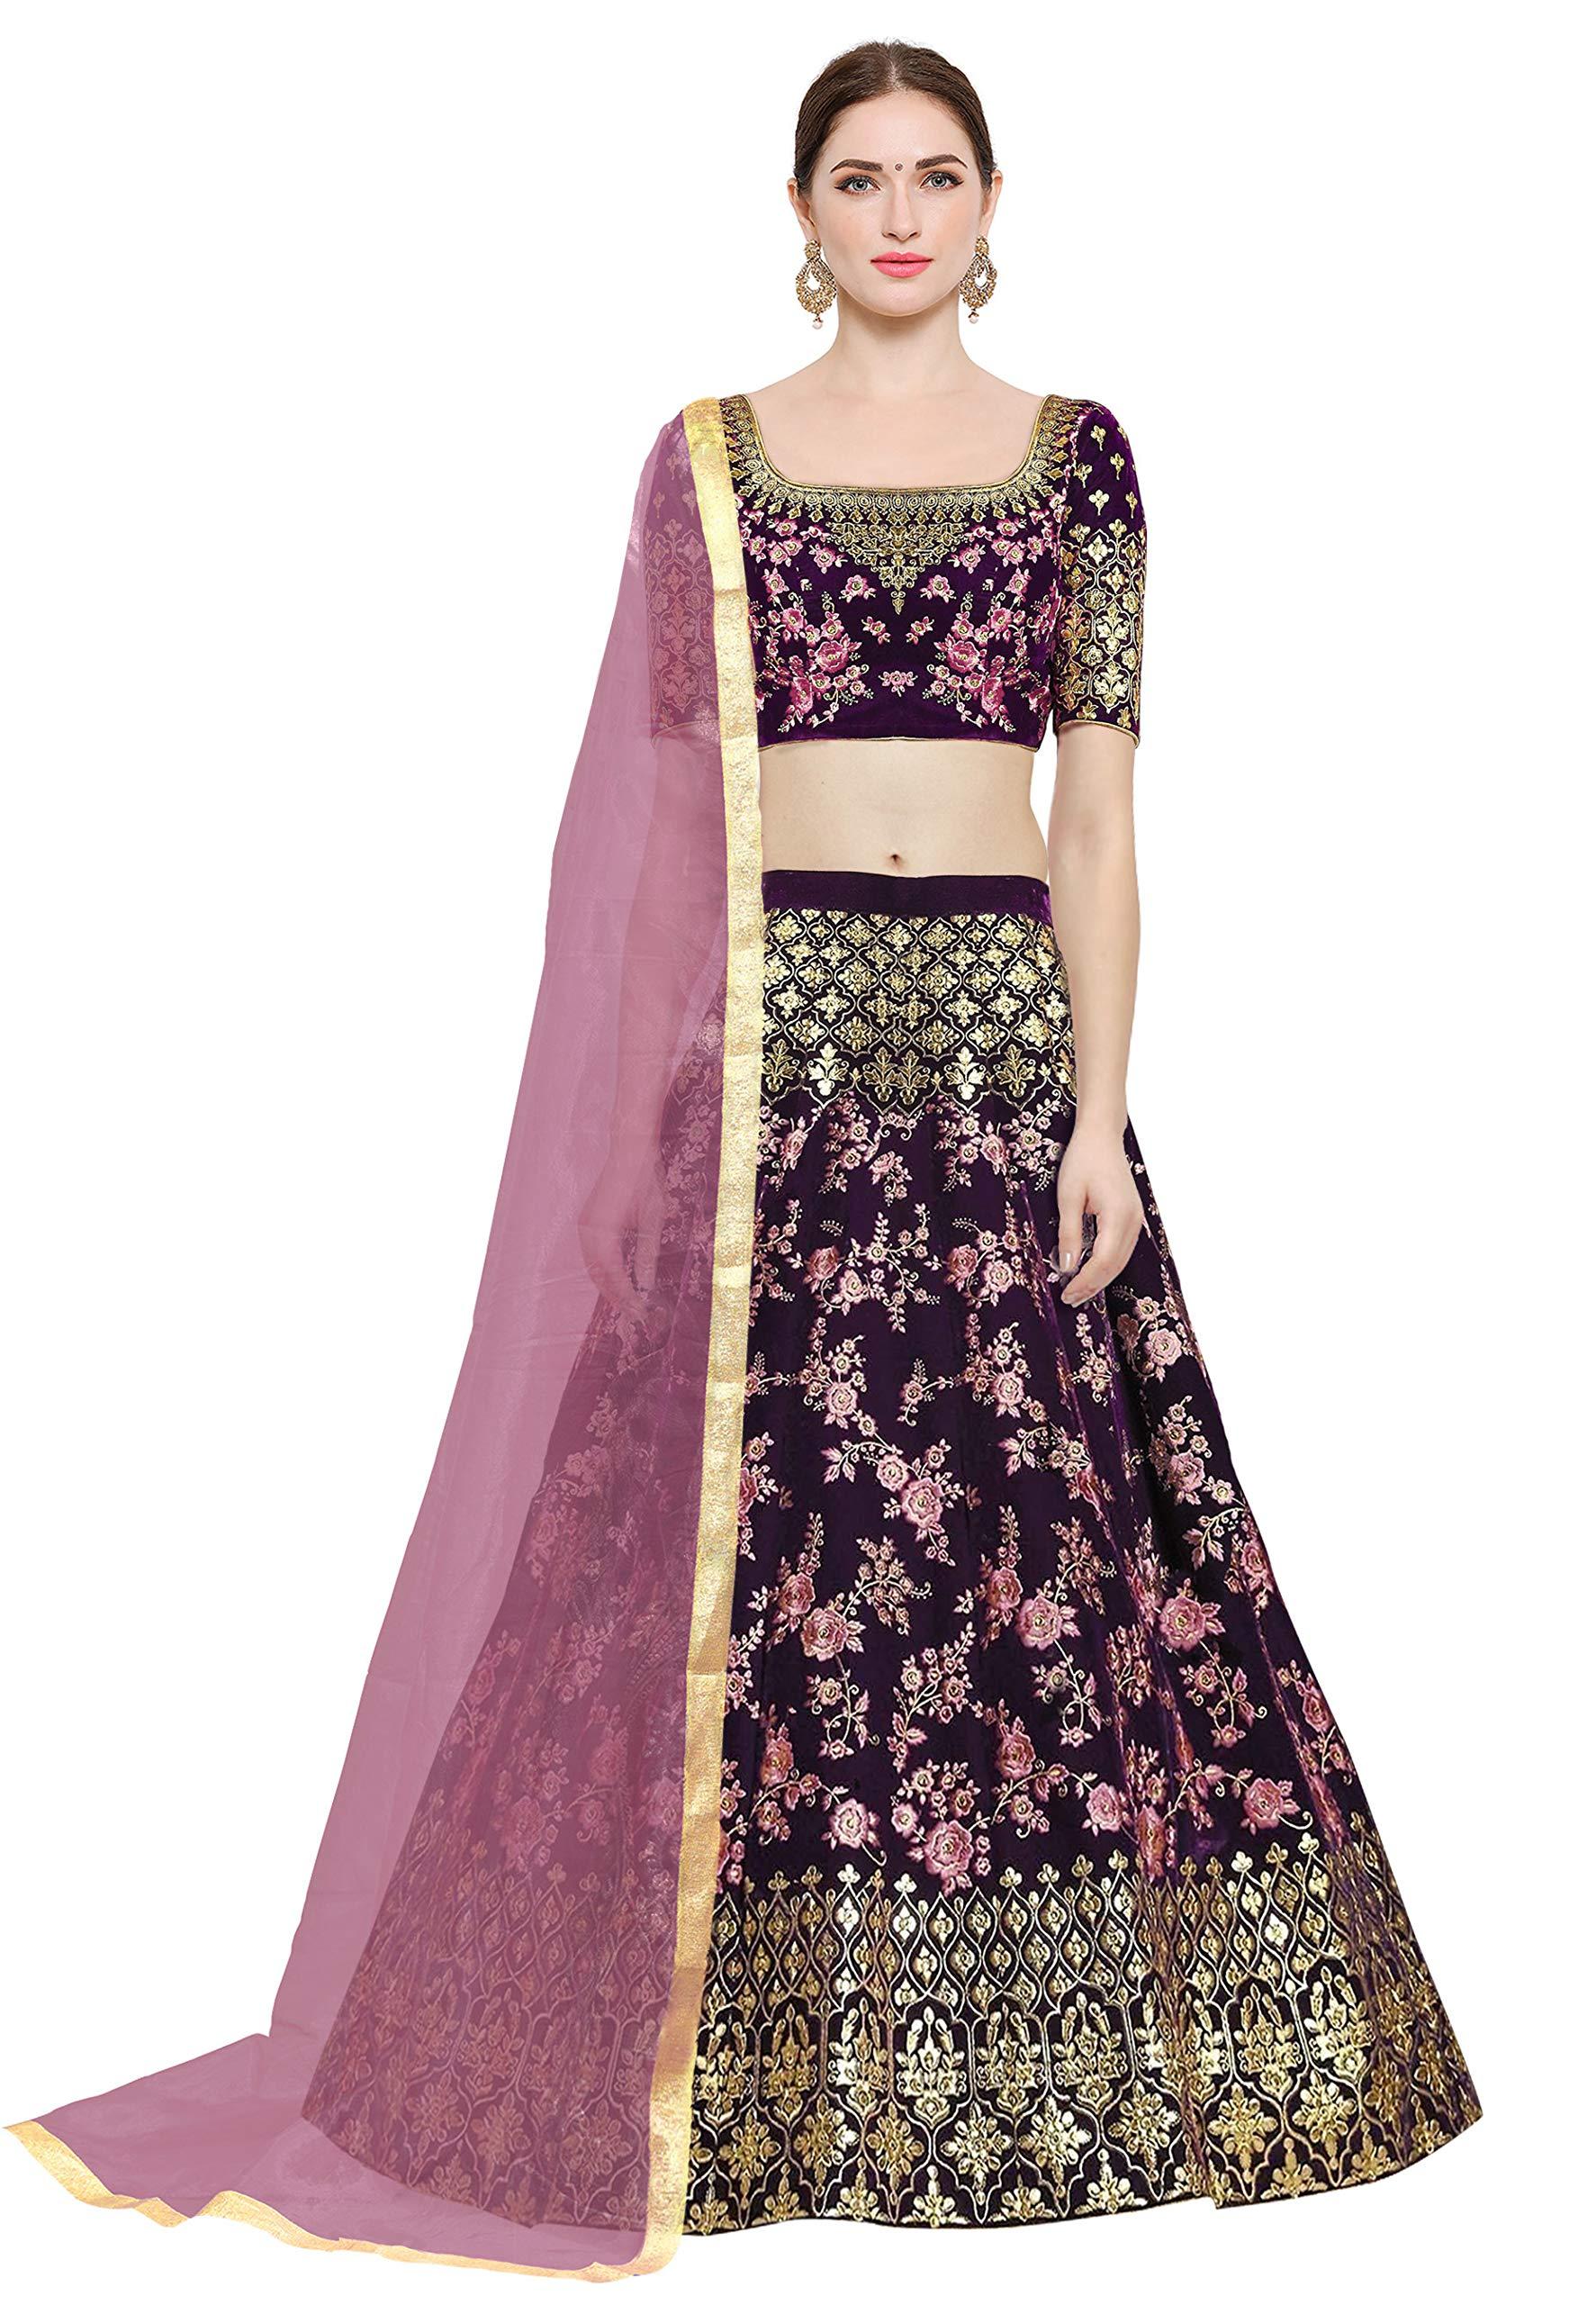 79248d5401 KEDARFAB Women's Taffeta Silk Embroidered Lehenga Choli with Blouse Piece  (Pink,Free Size) - Gia Designer